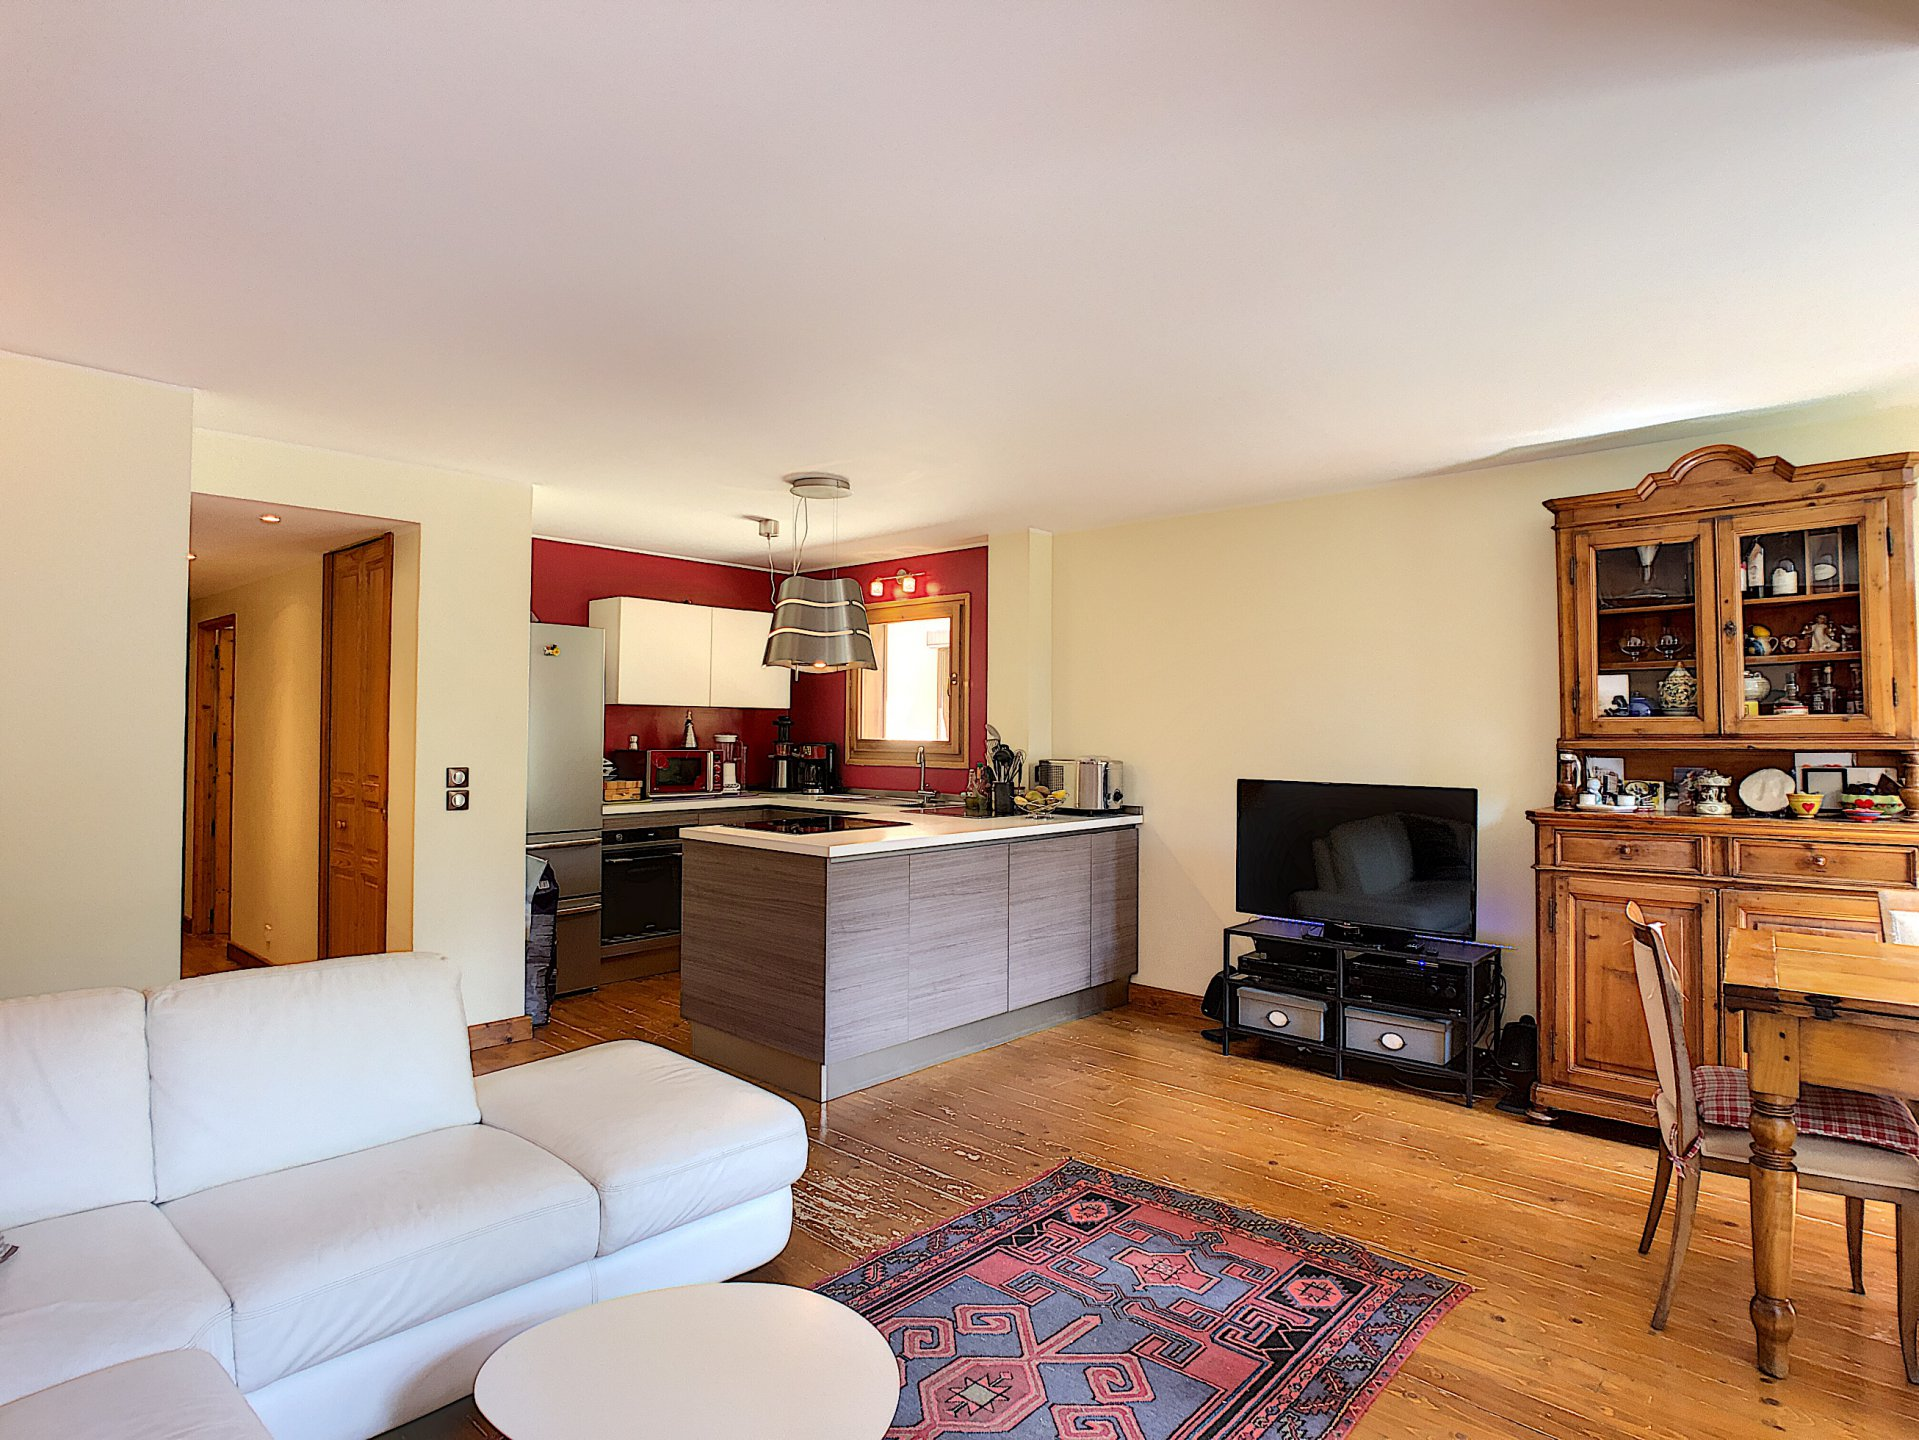 Appartement 2 chambres, Chamonix-Mont-Blanc Les Tines